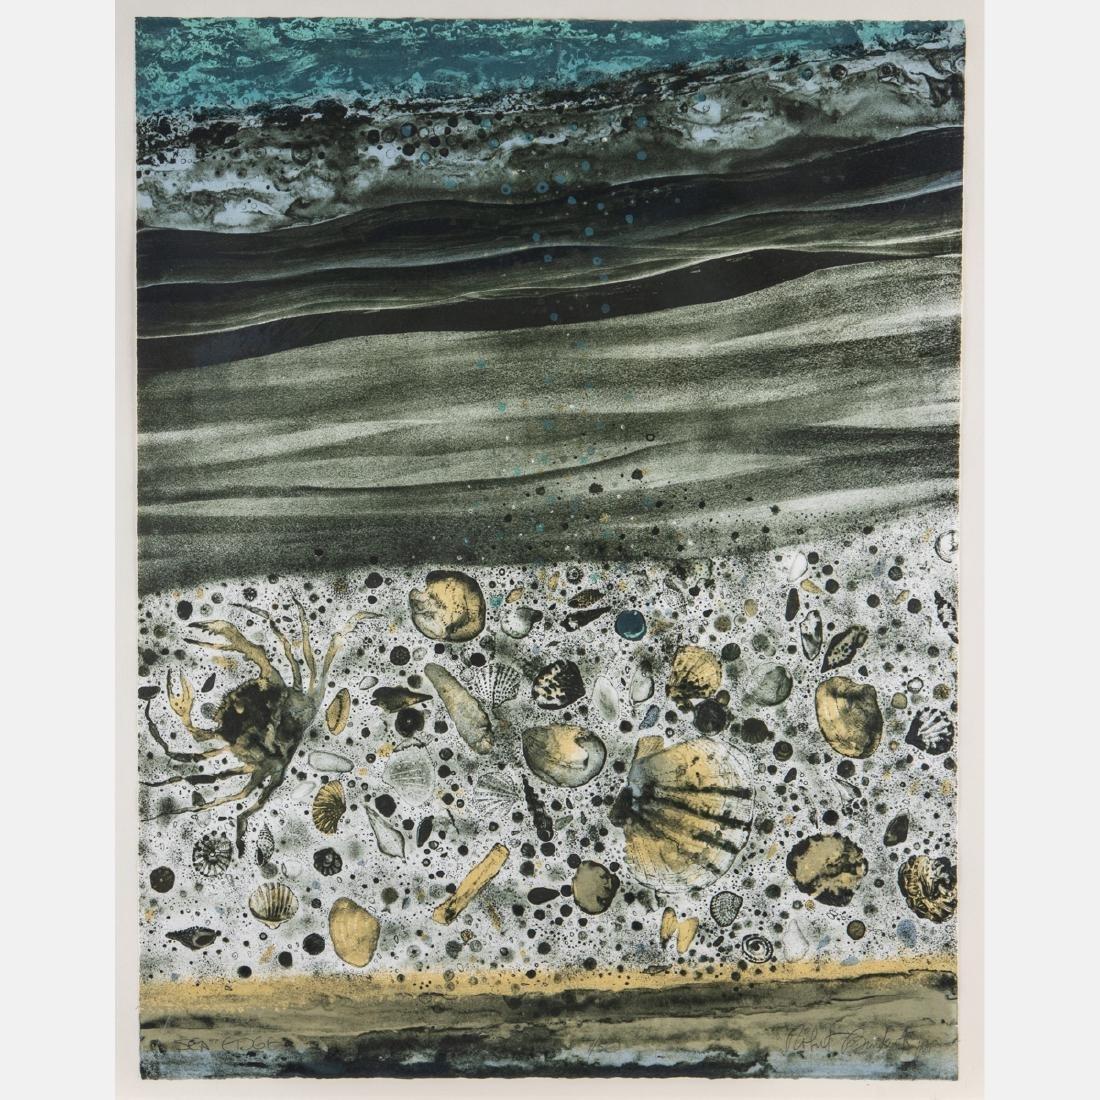 Robert Randall Burkert (b. 1930) 'Sea Edge' and 'Shore - 3